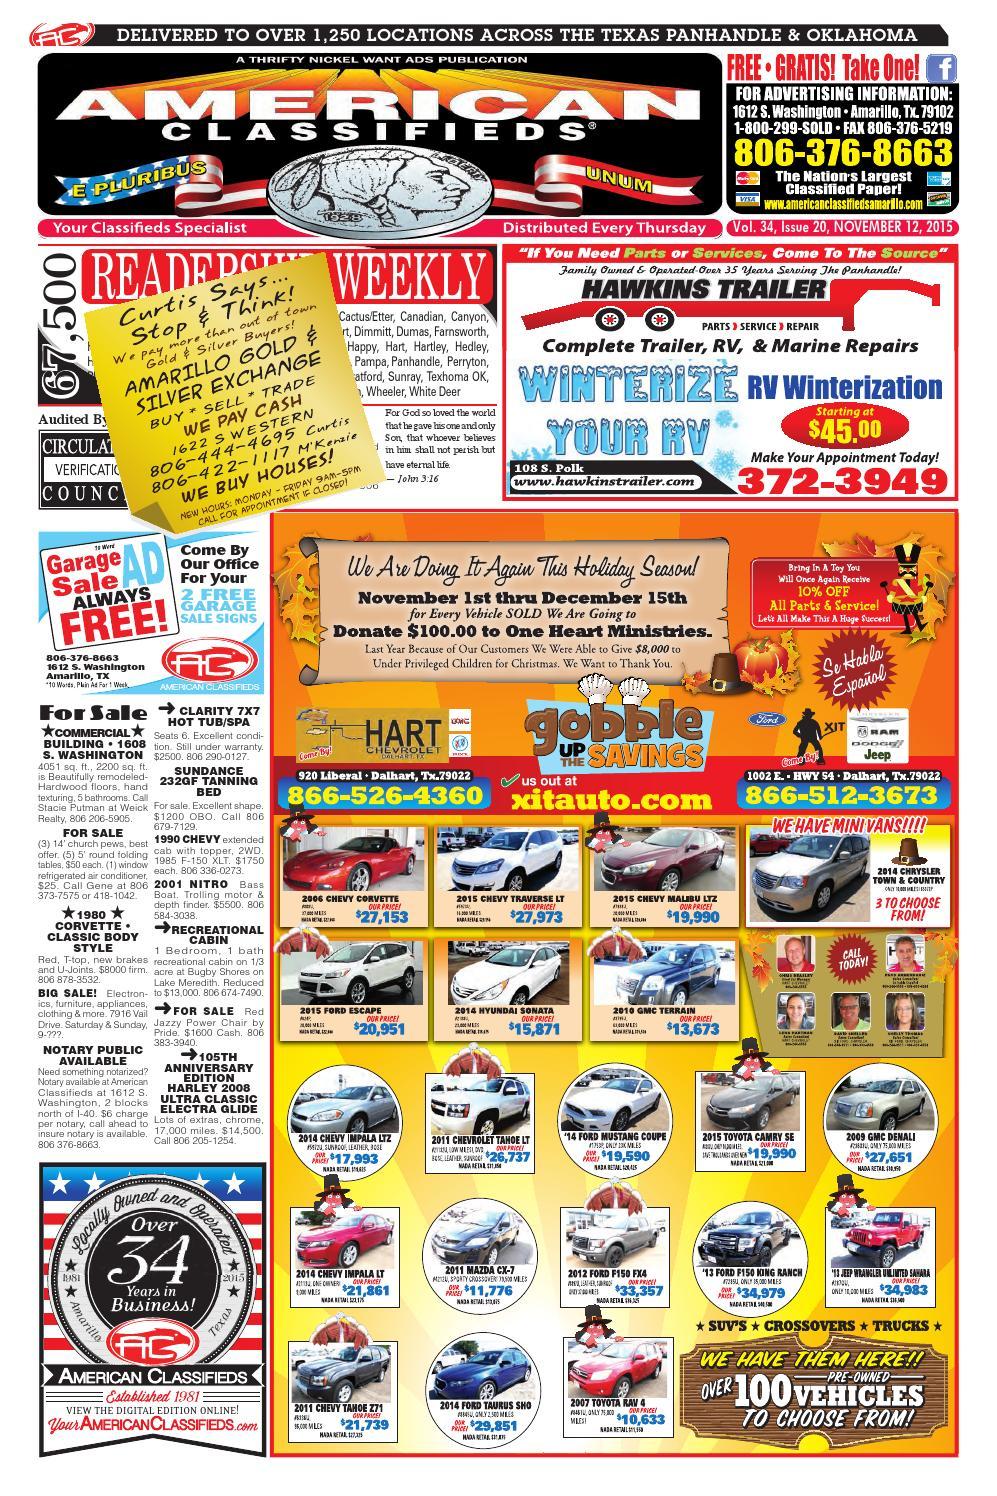 Miami Sundance Spa >> American Classifieds | Amarillo, TX | Nov 12, 2015 by American Classifieds - Issuu